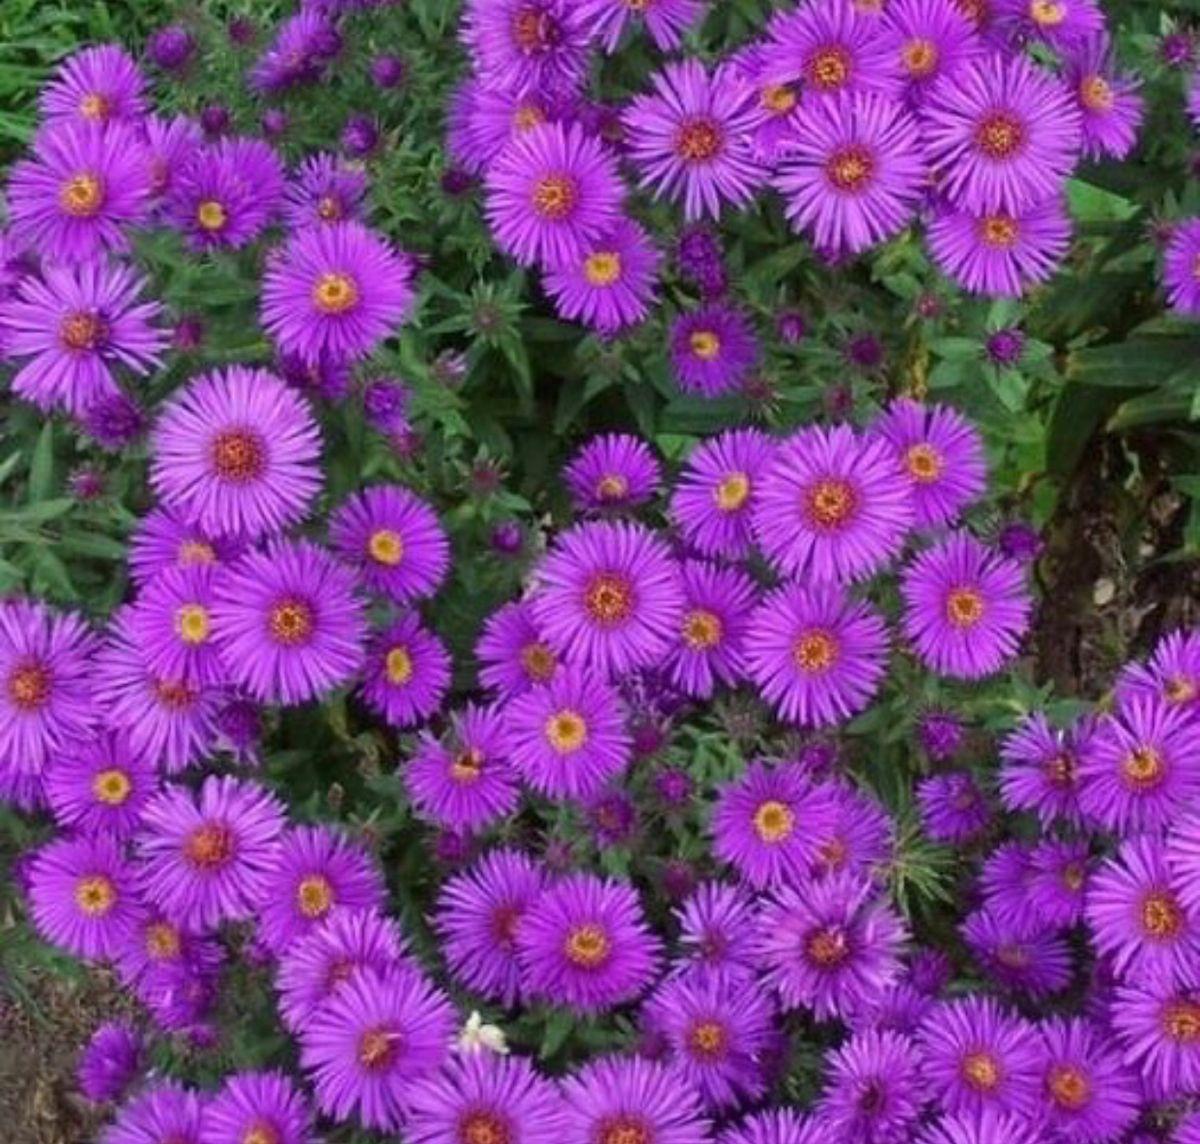 Aster Flower In 2020 Flower Seeds Online Aster Flower Flower Landscape